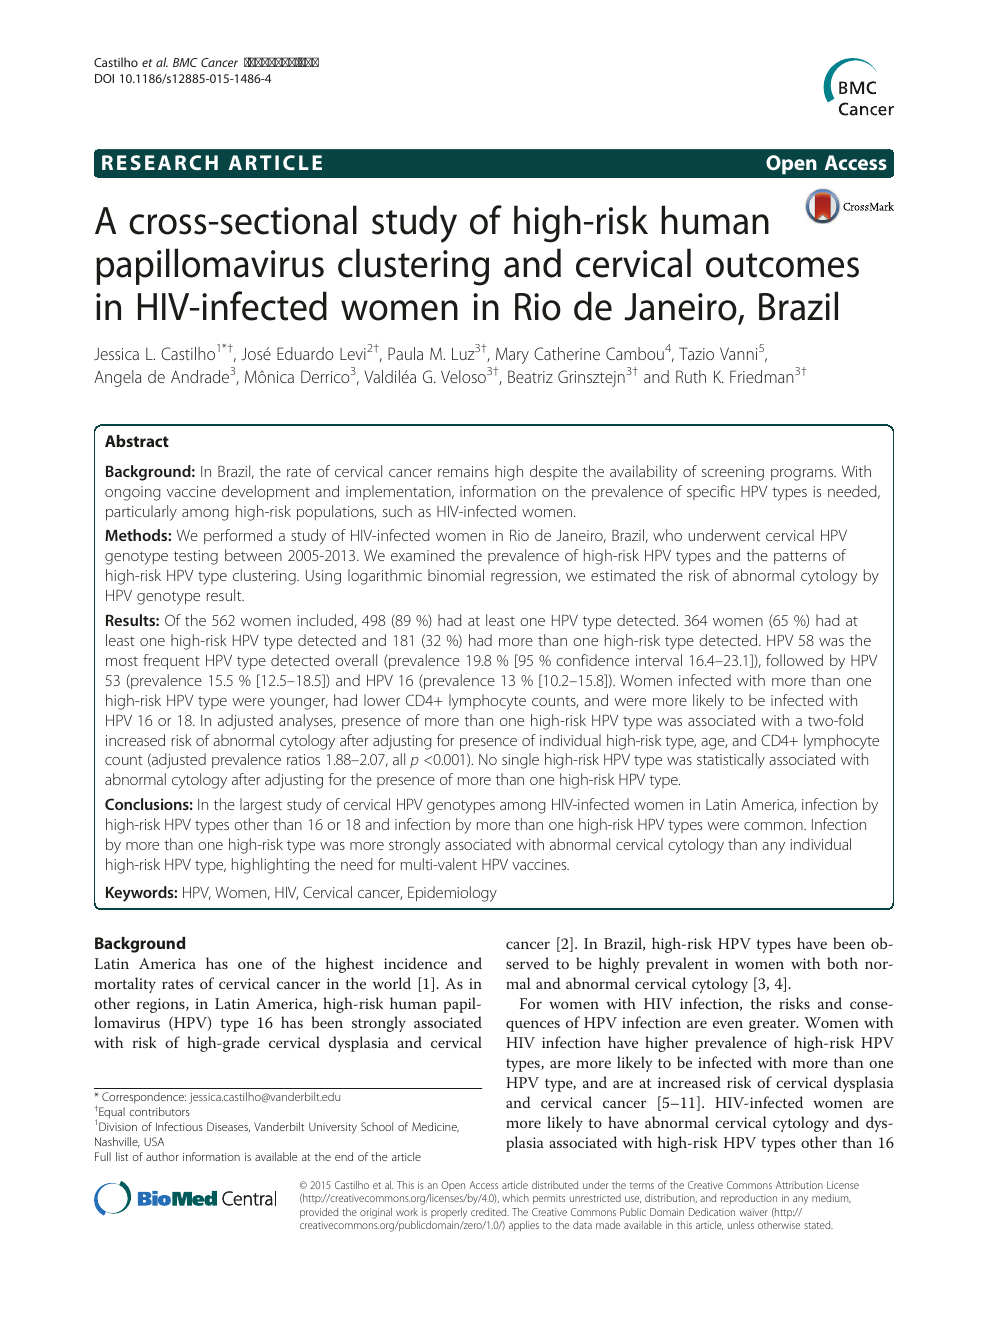 hpv high risk genotype tp)